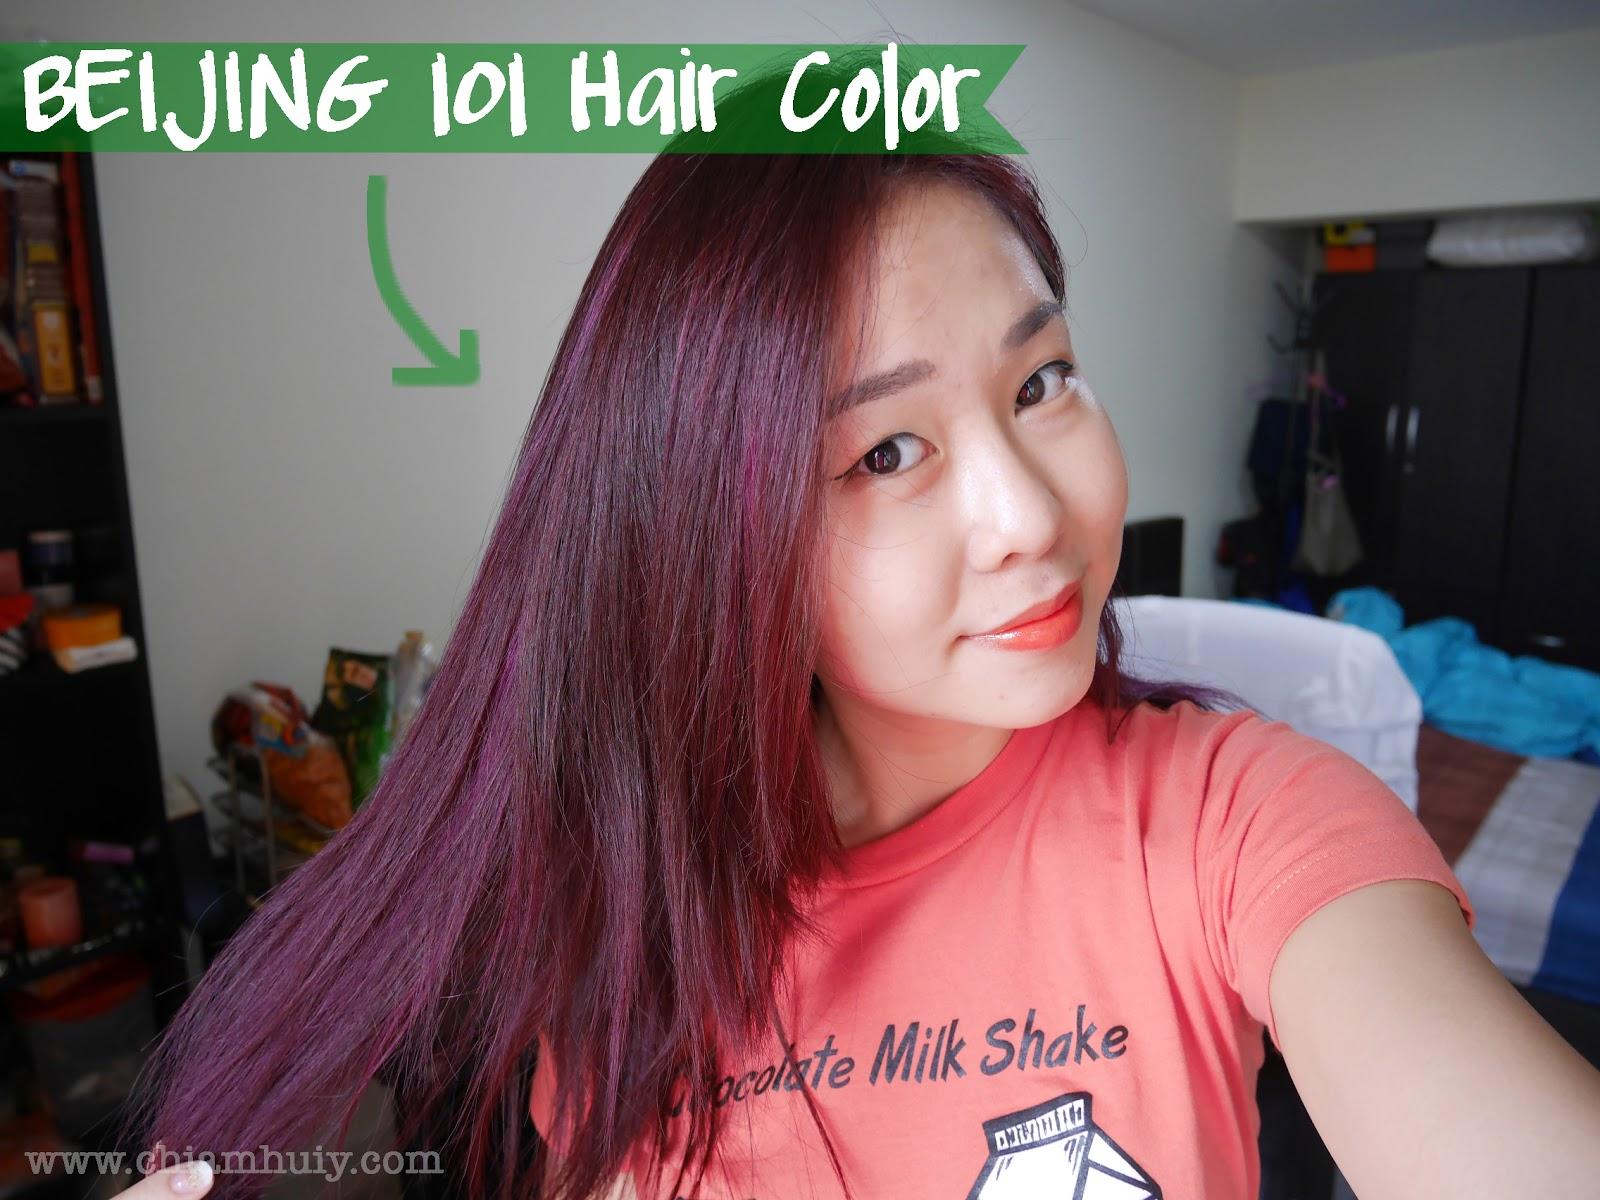 Beijing 101 Herbal Hair Dye Day! - Celine Chiam ...